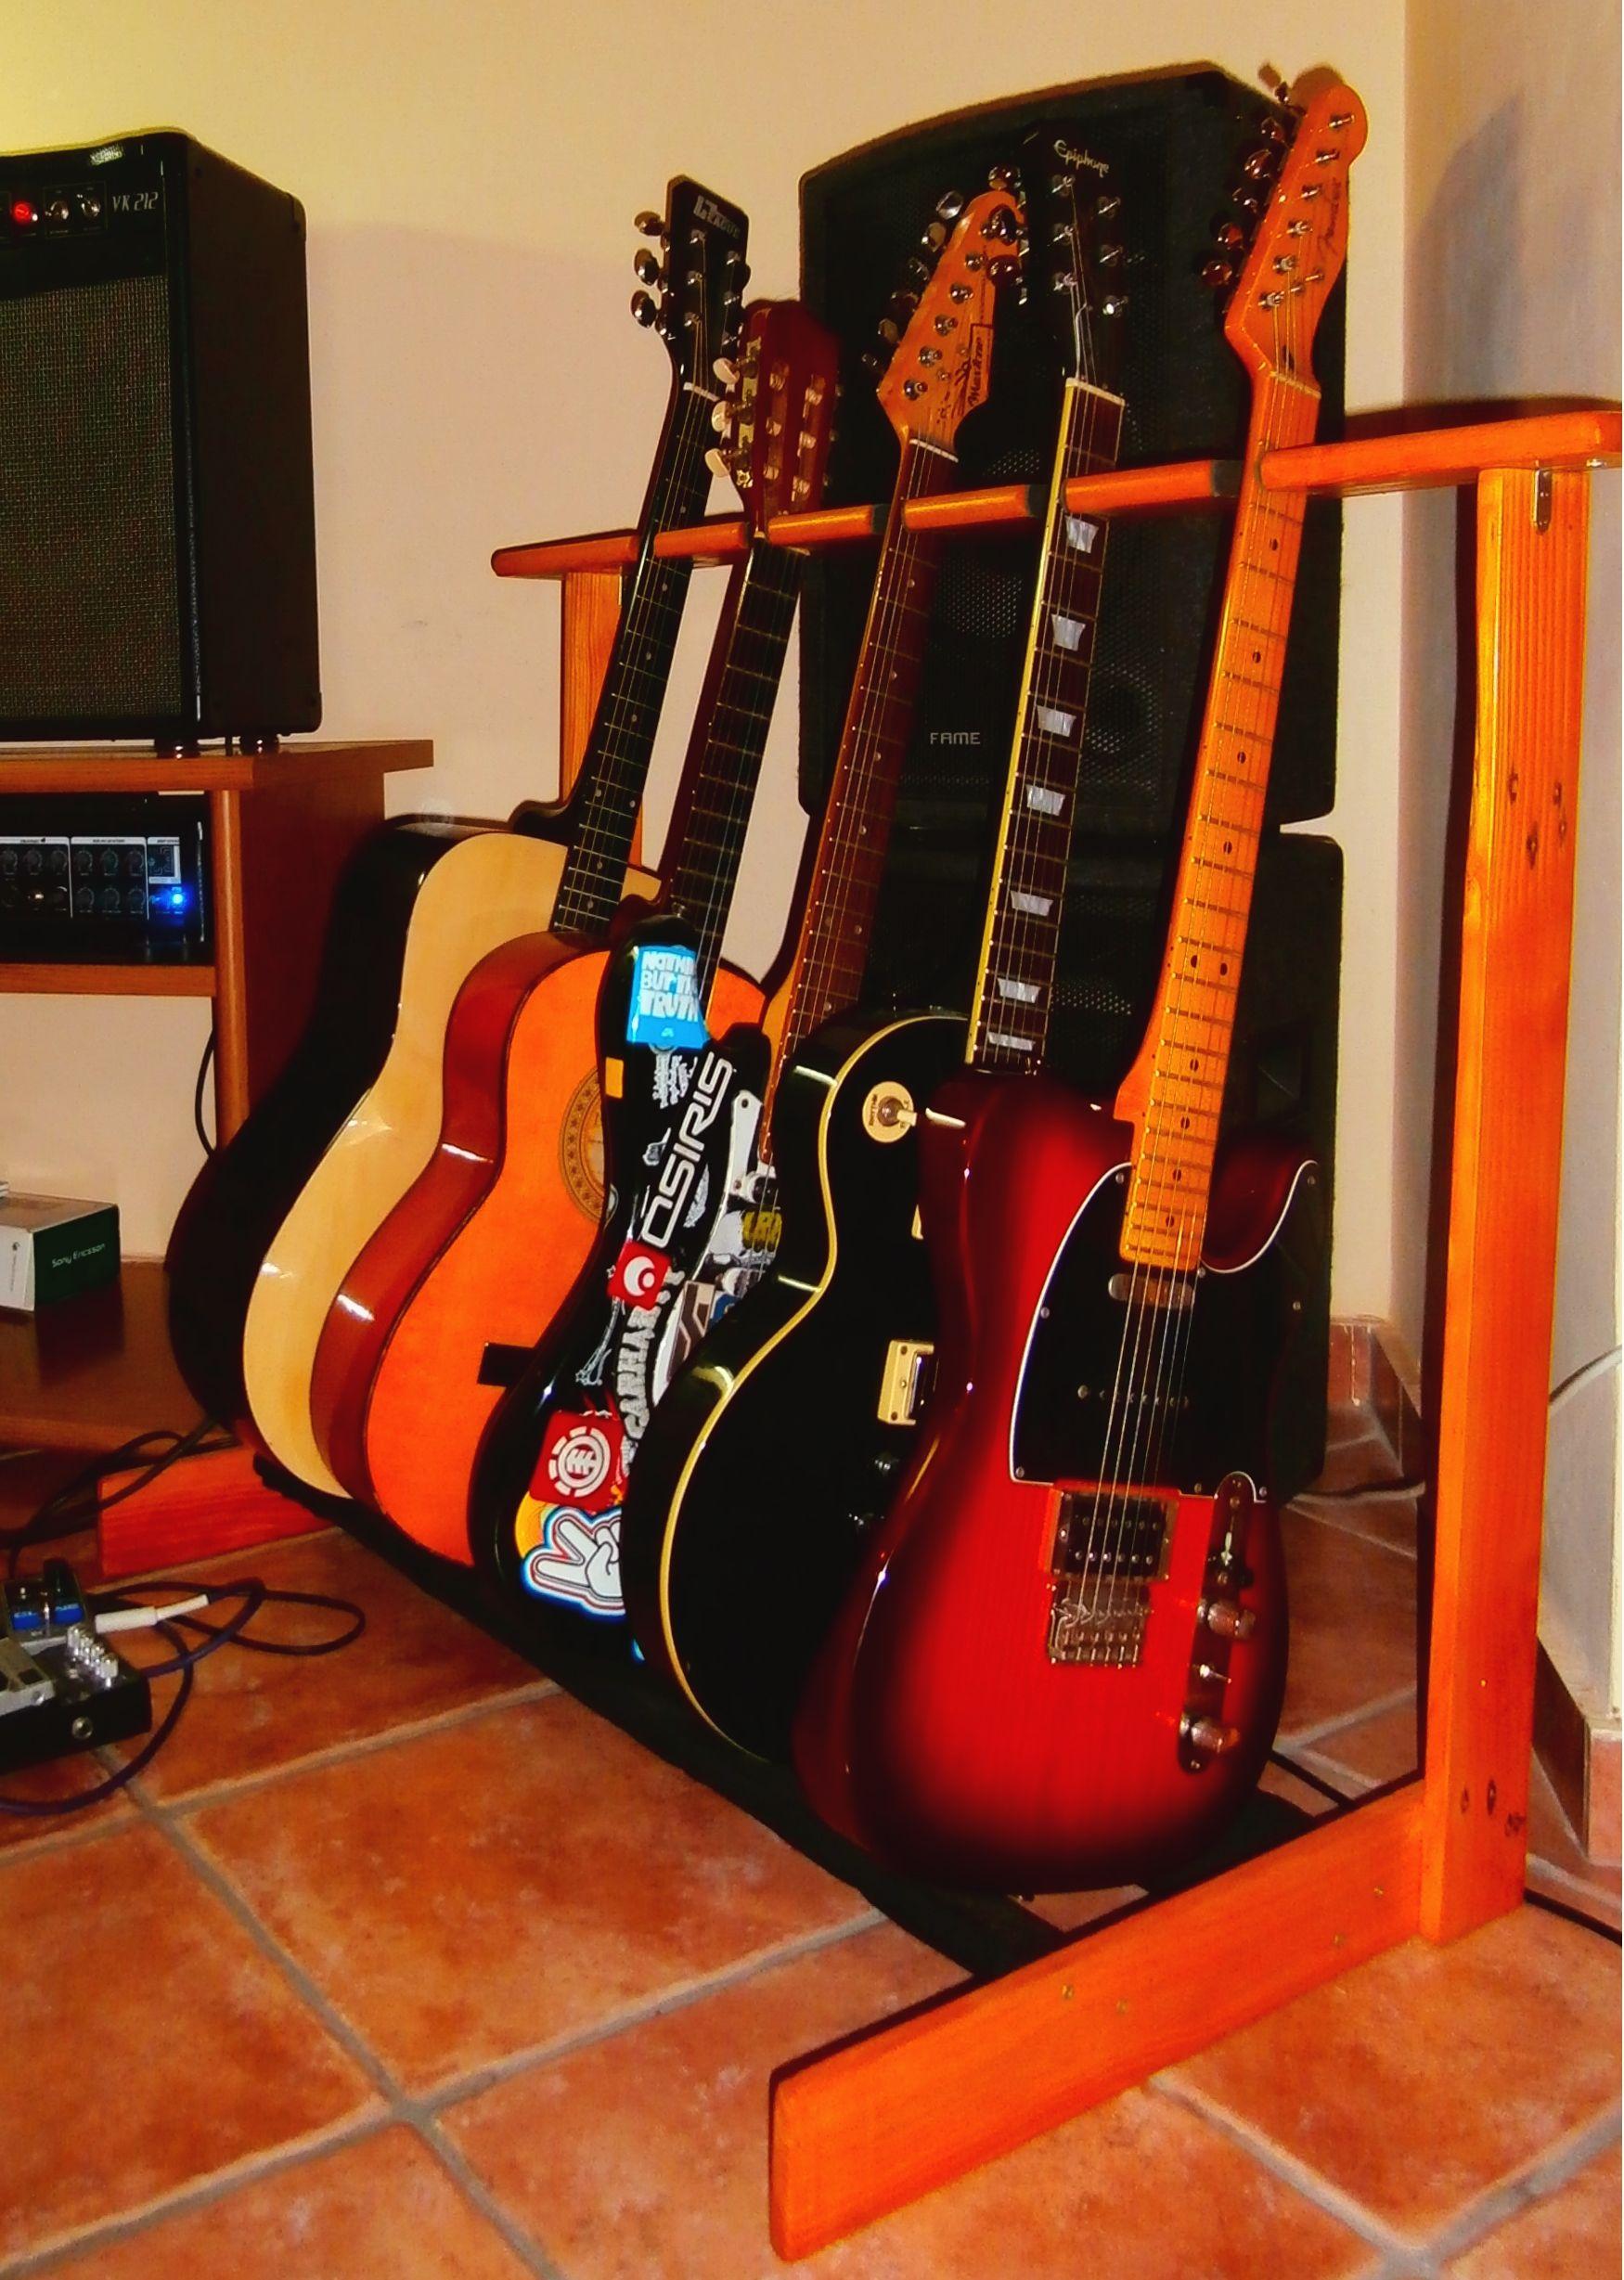 Diy pallet guitar stand my stuff pinterest guitar stand diy pallet guitar stand solutioingenieria Gallery